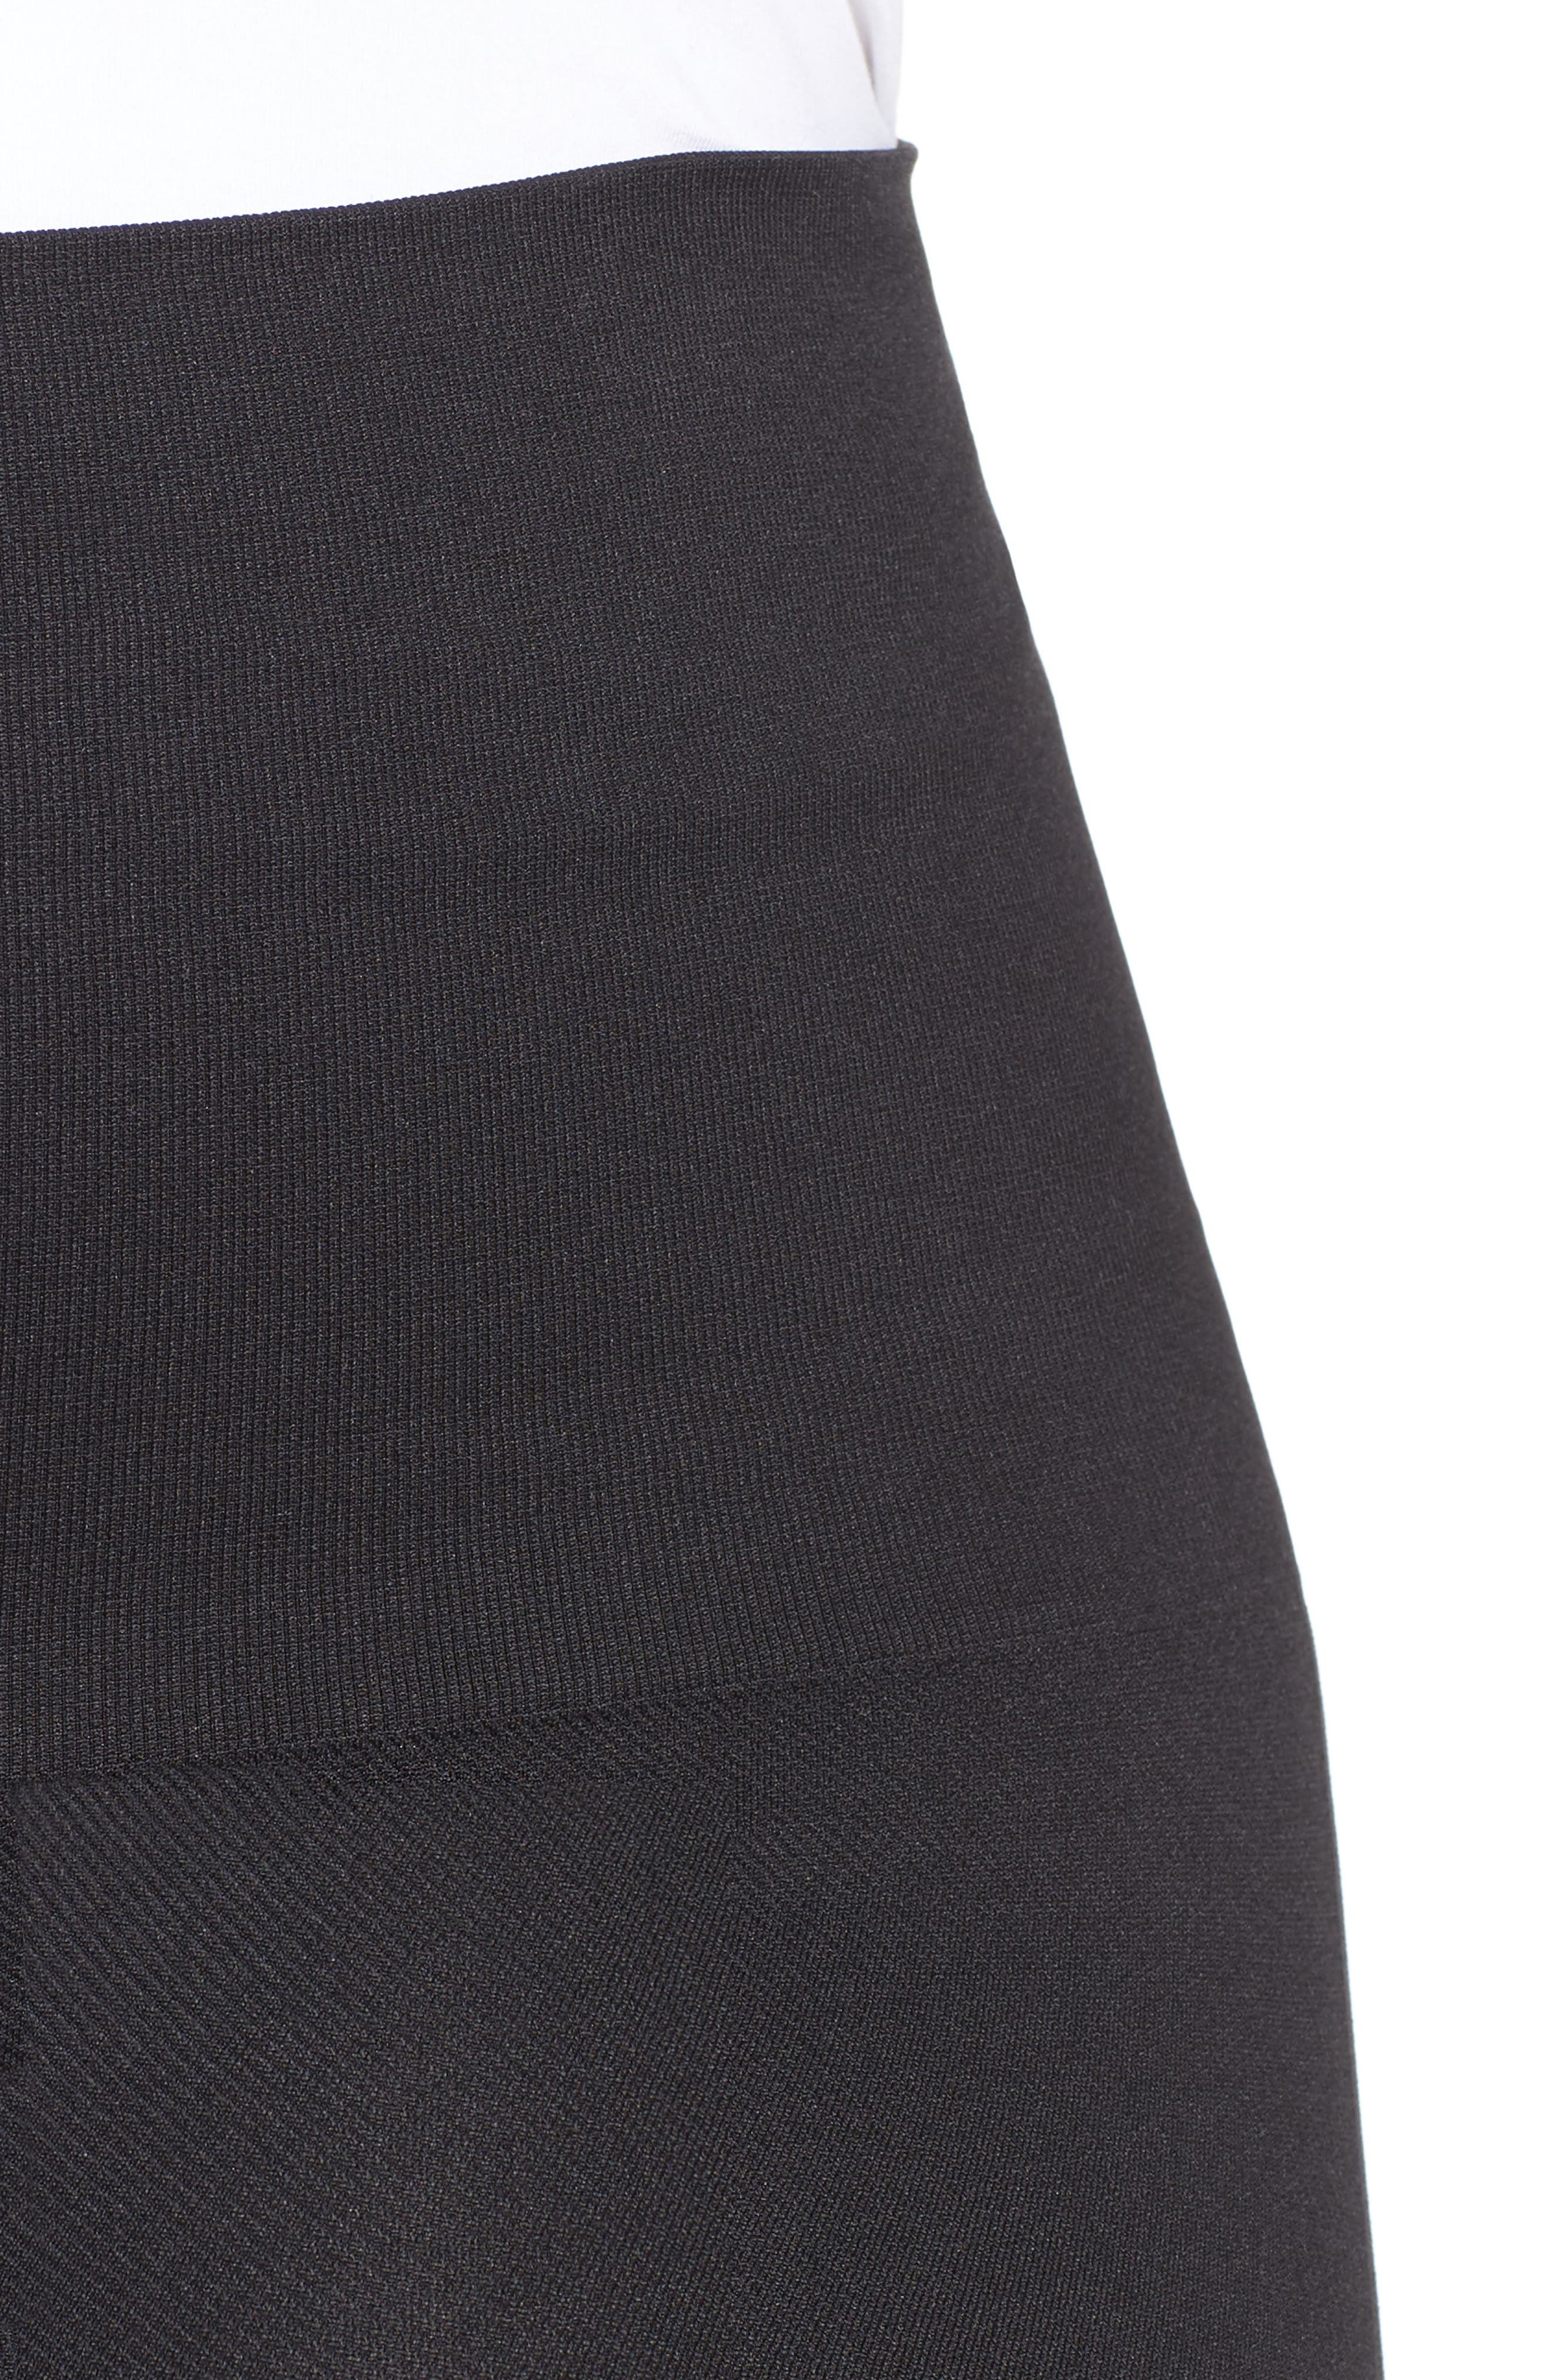 Alternate Image 5  - SPANX® Look At Me Now Seamless Leggings (Plus Size)